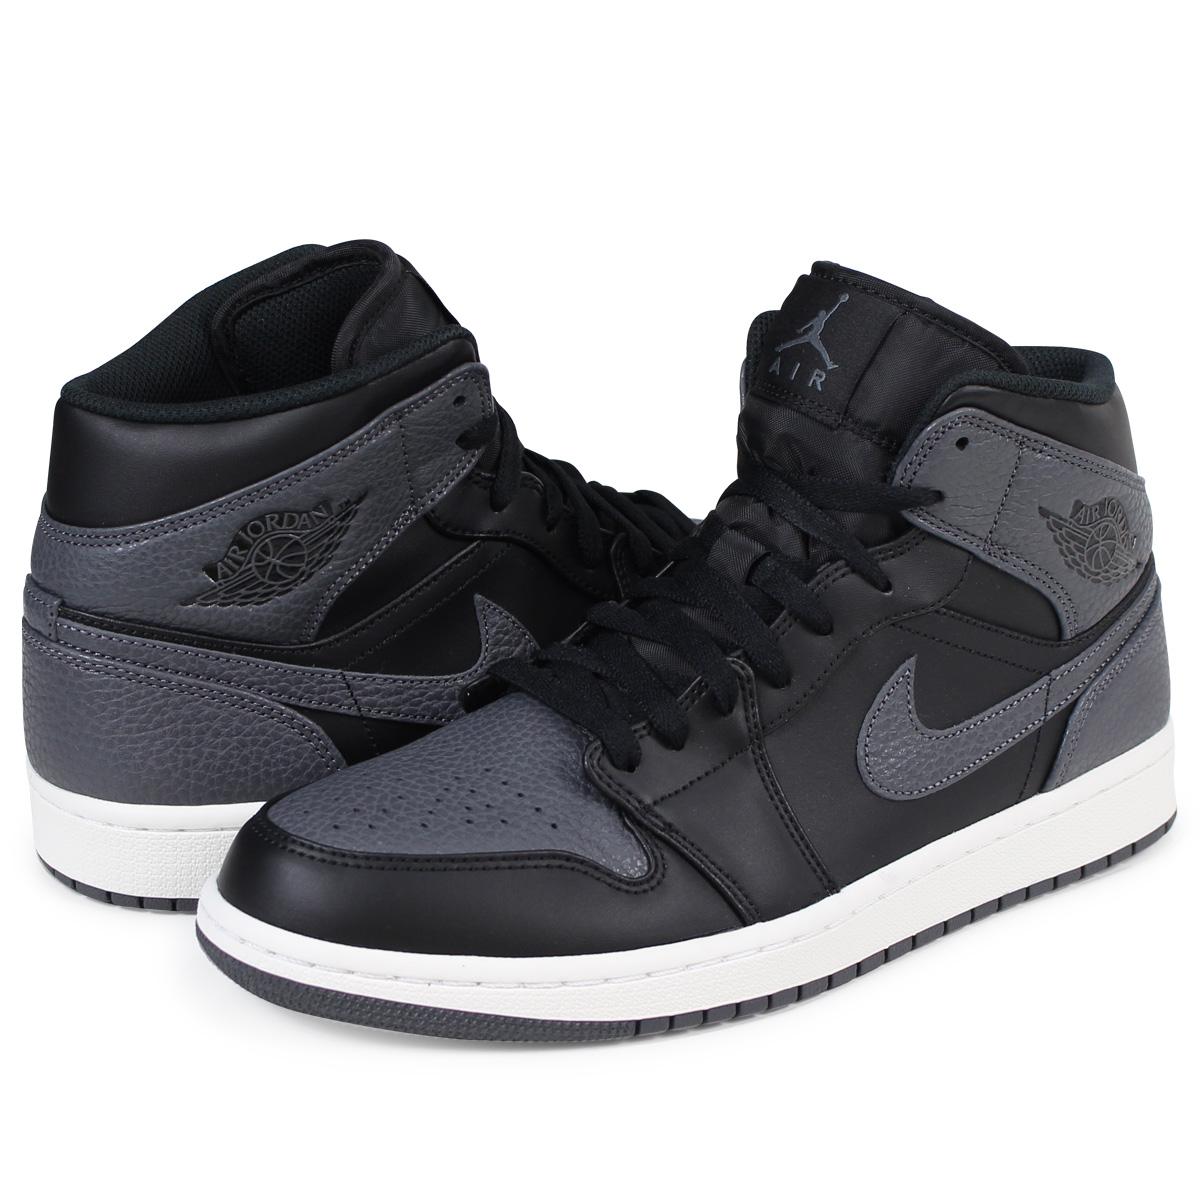 61d78a4d5c4 ... black white gym red footshop 597b9 f4c40; shop nike air jordan 1 mid bg nike  air jordan 1 ladys sneakers 554725 041 shoes